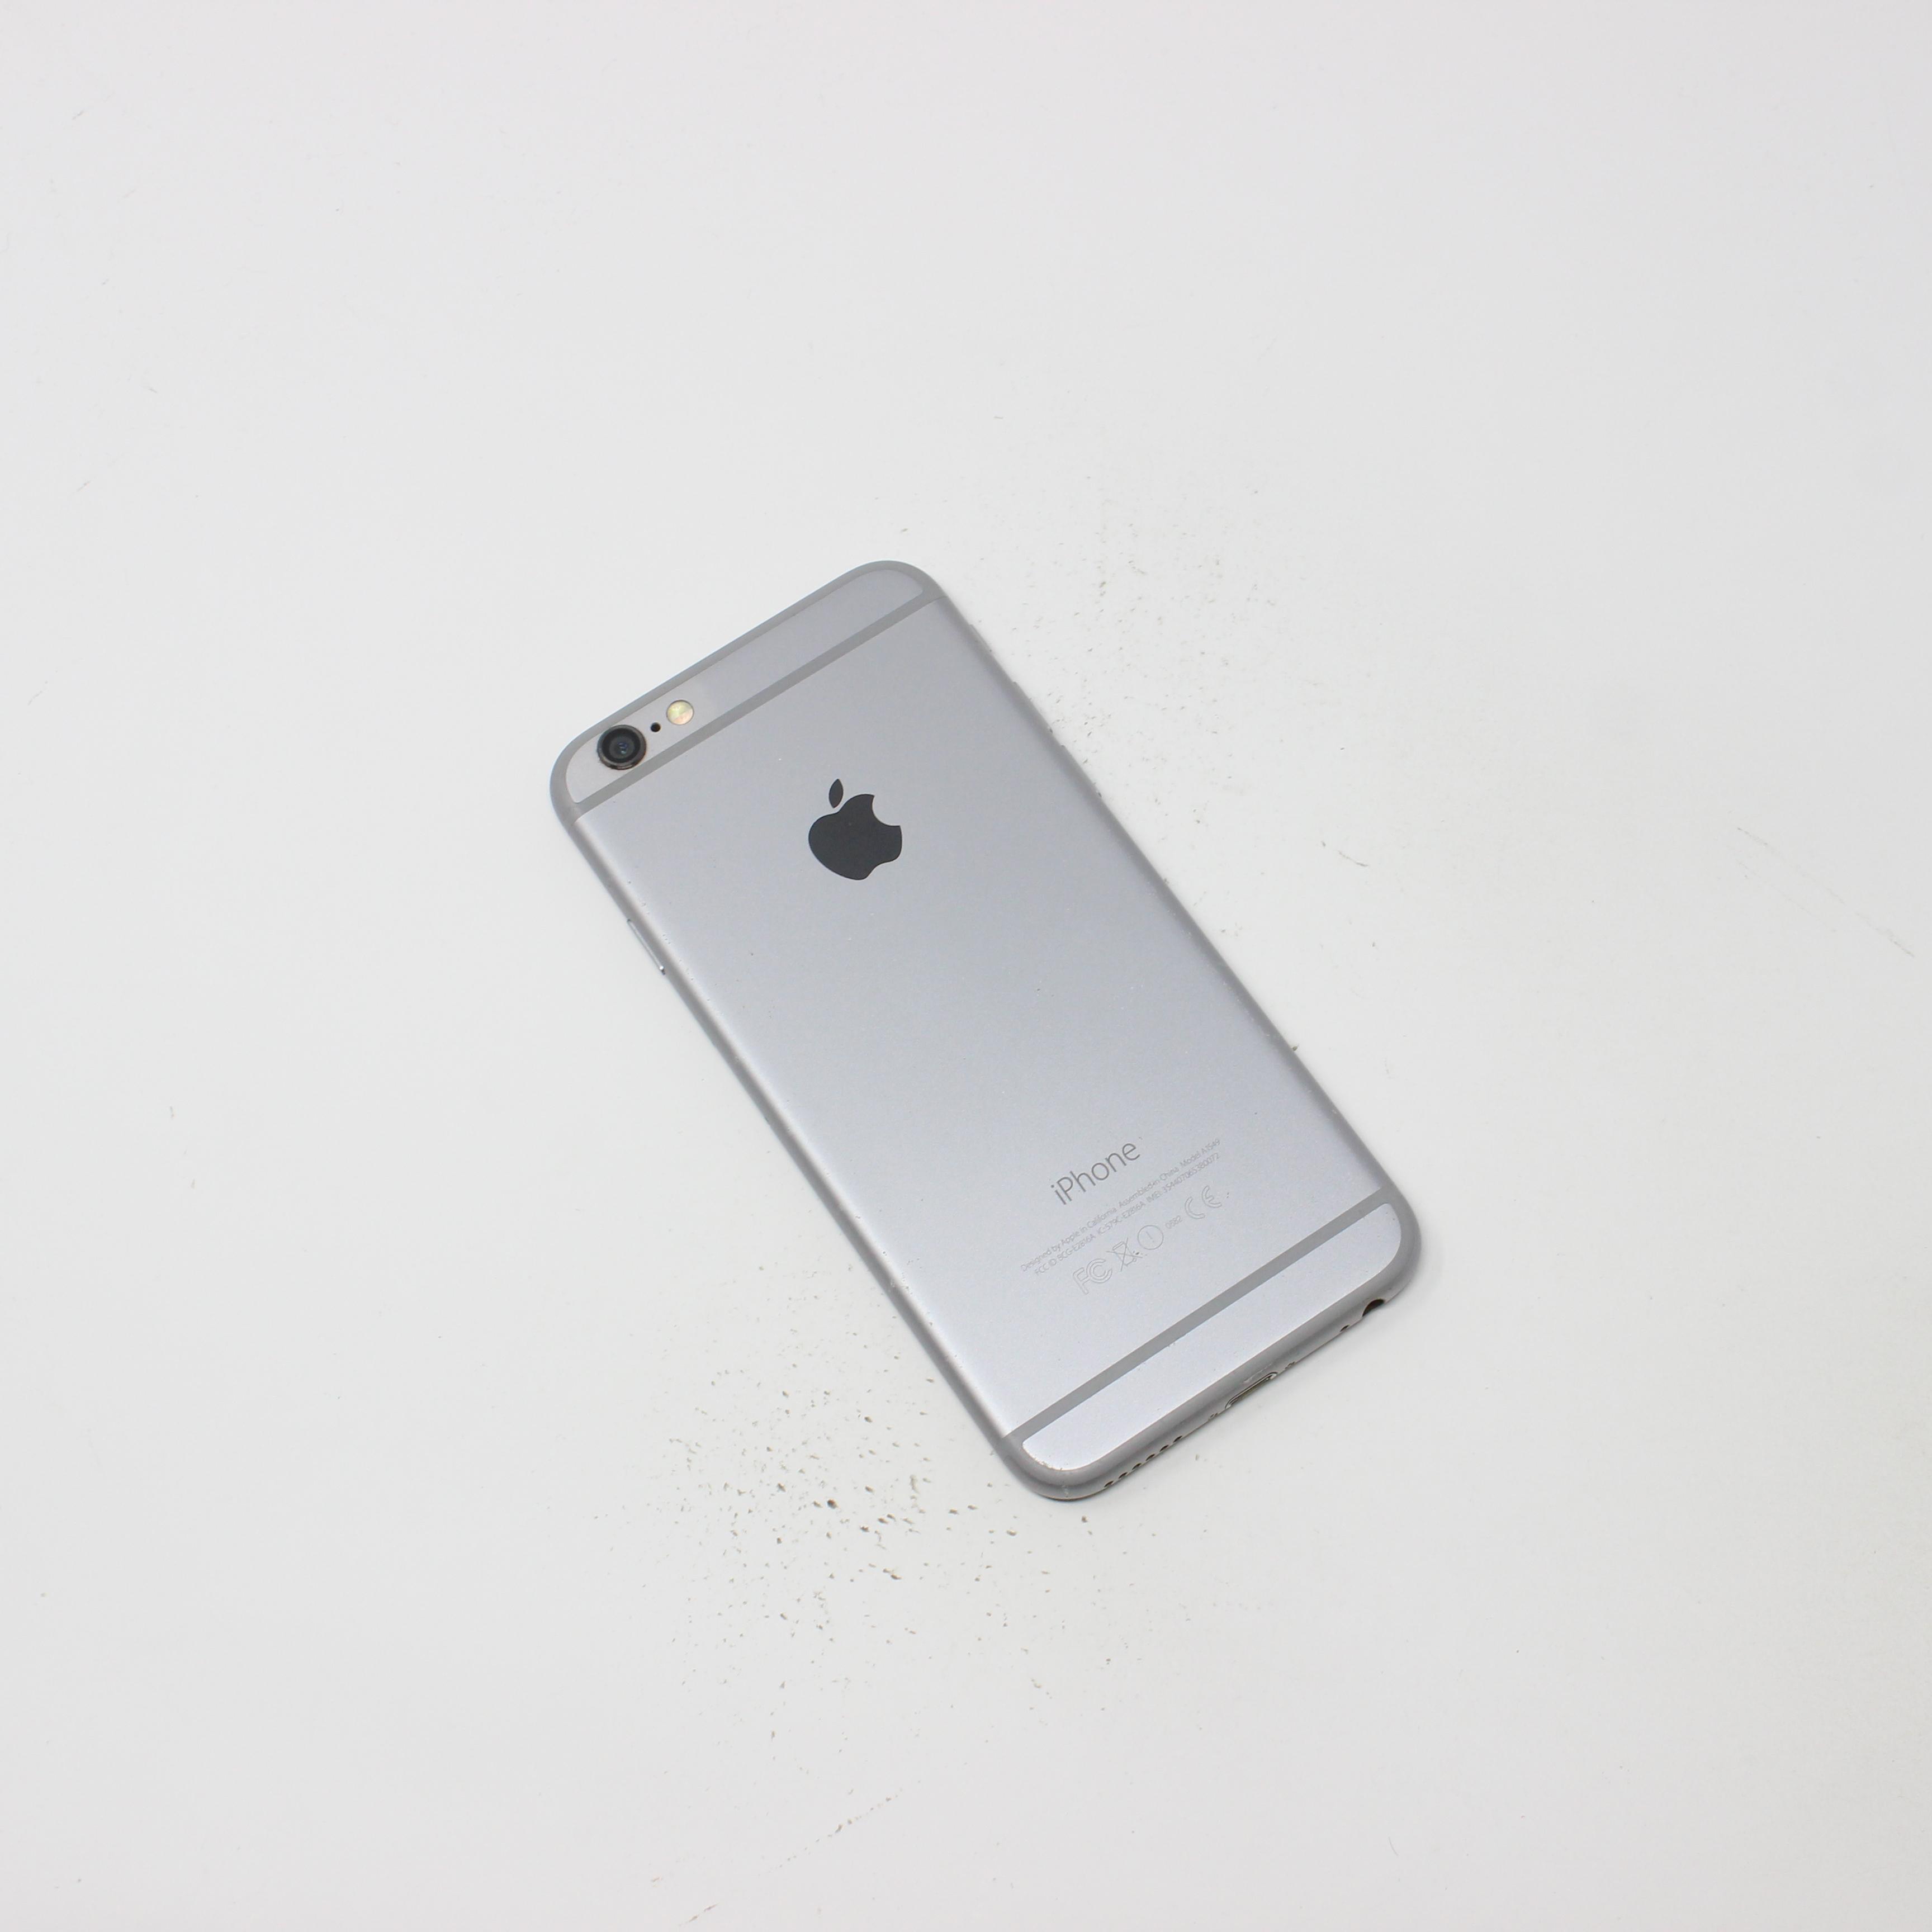 iPhone 6 16GB Space Gray - Verizon photo 3 | UpTradeit.com